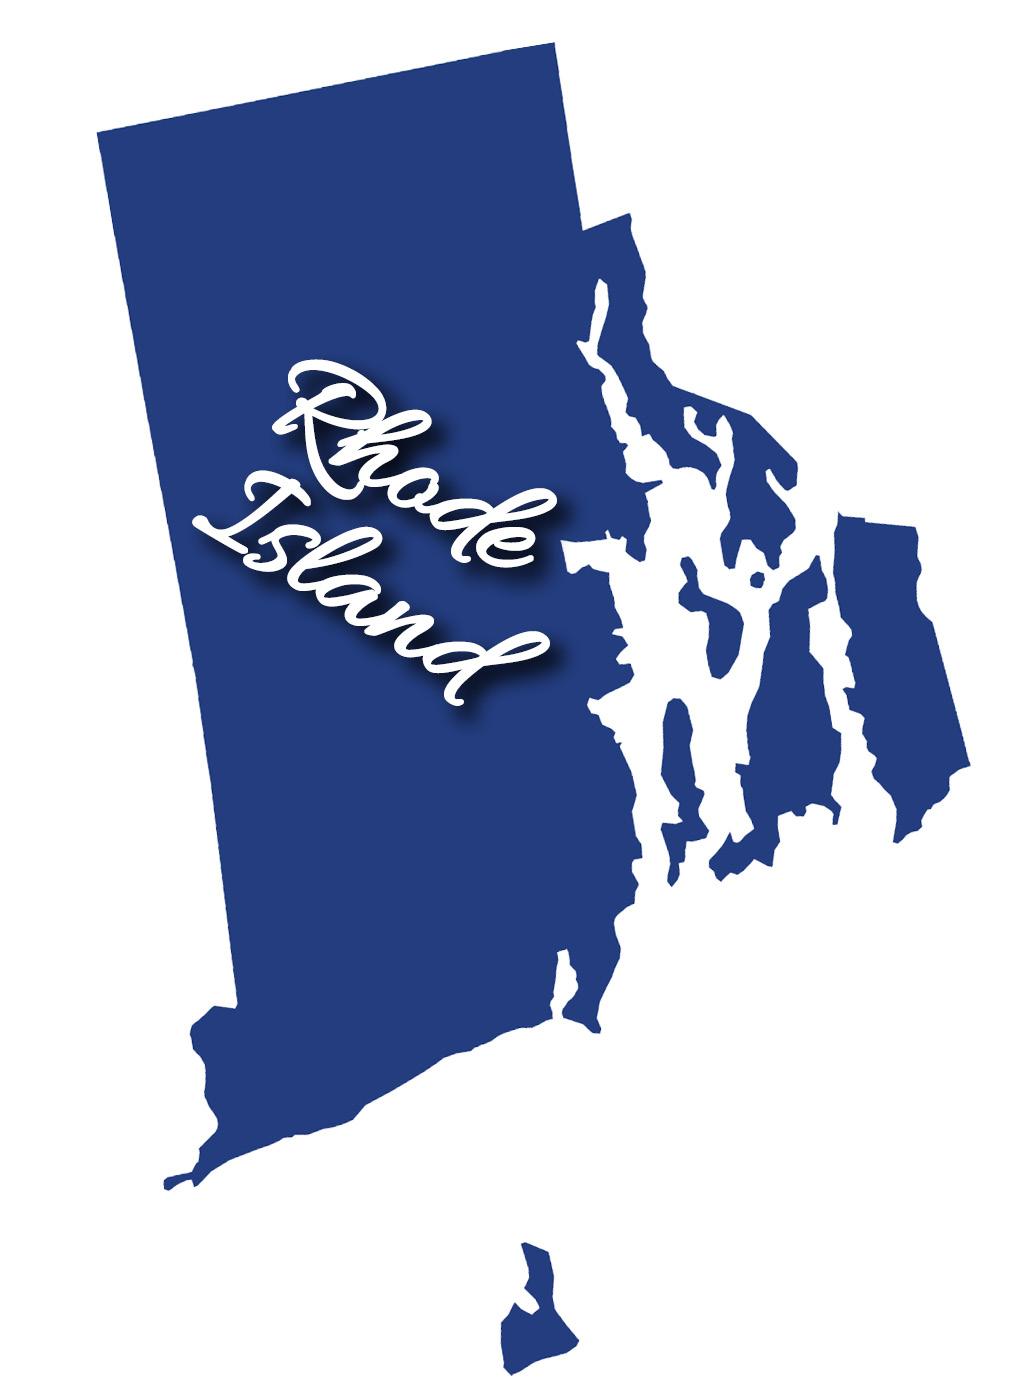 Rhode Island Approved 10 Year Warranty Program Amp Home